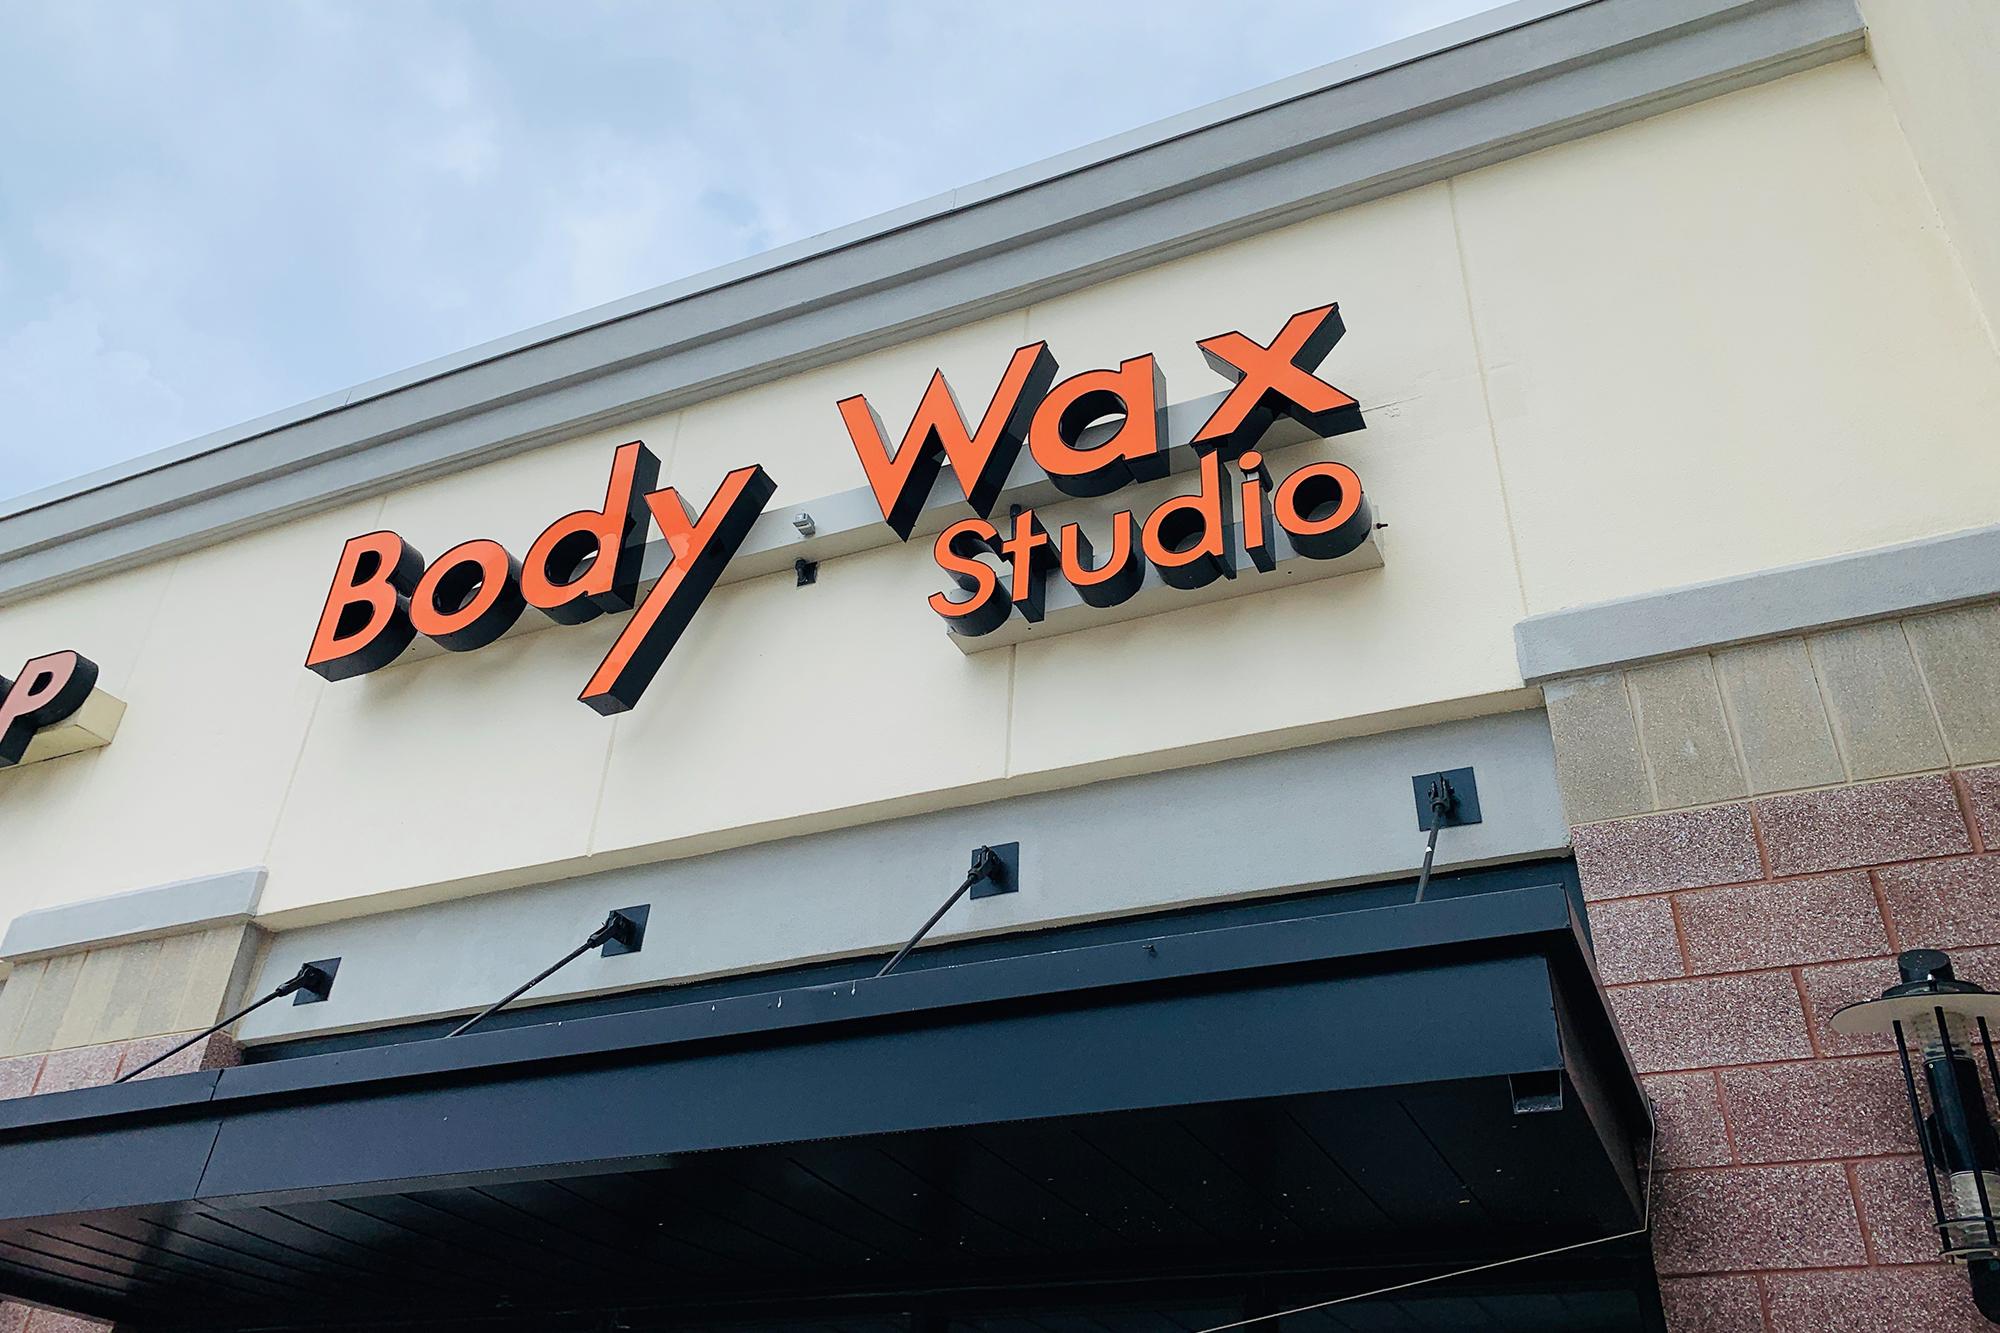 Body Wax Studio sign